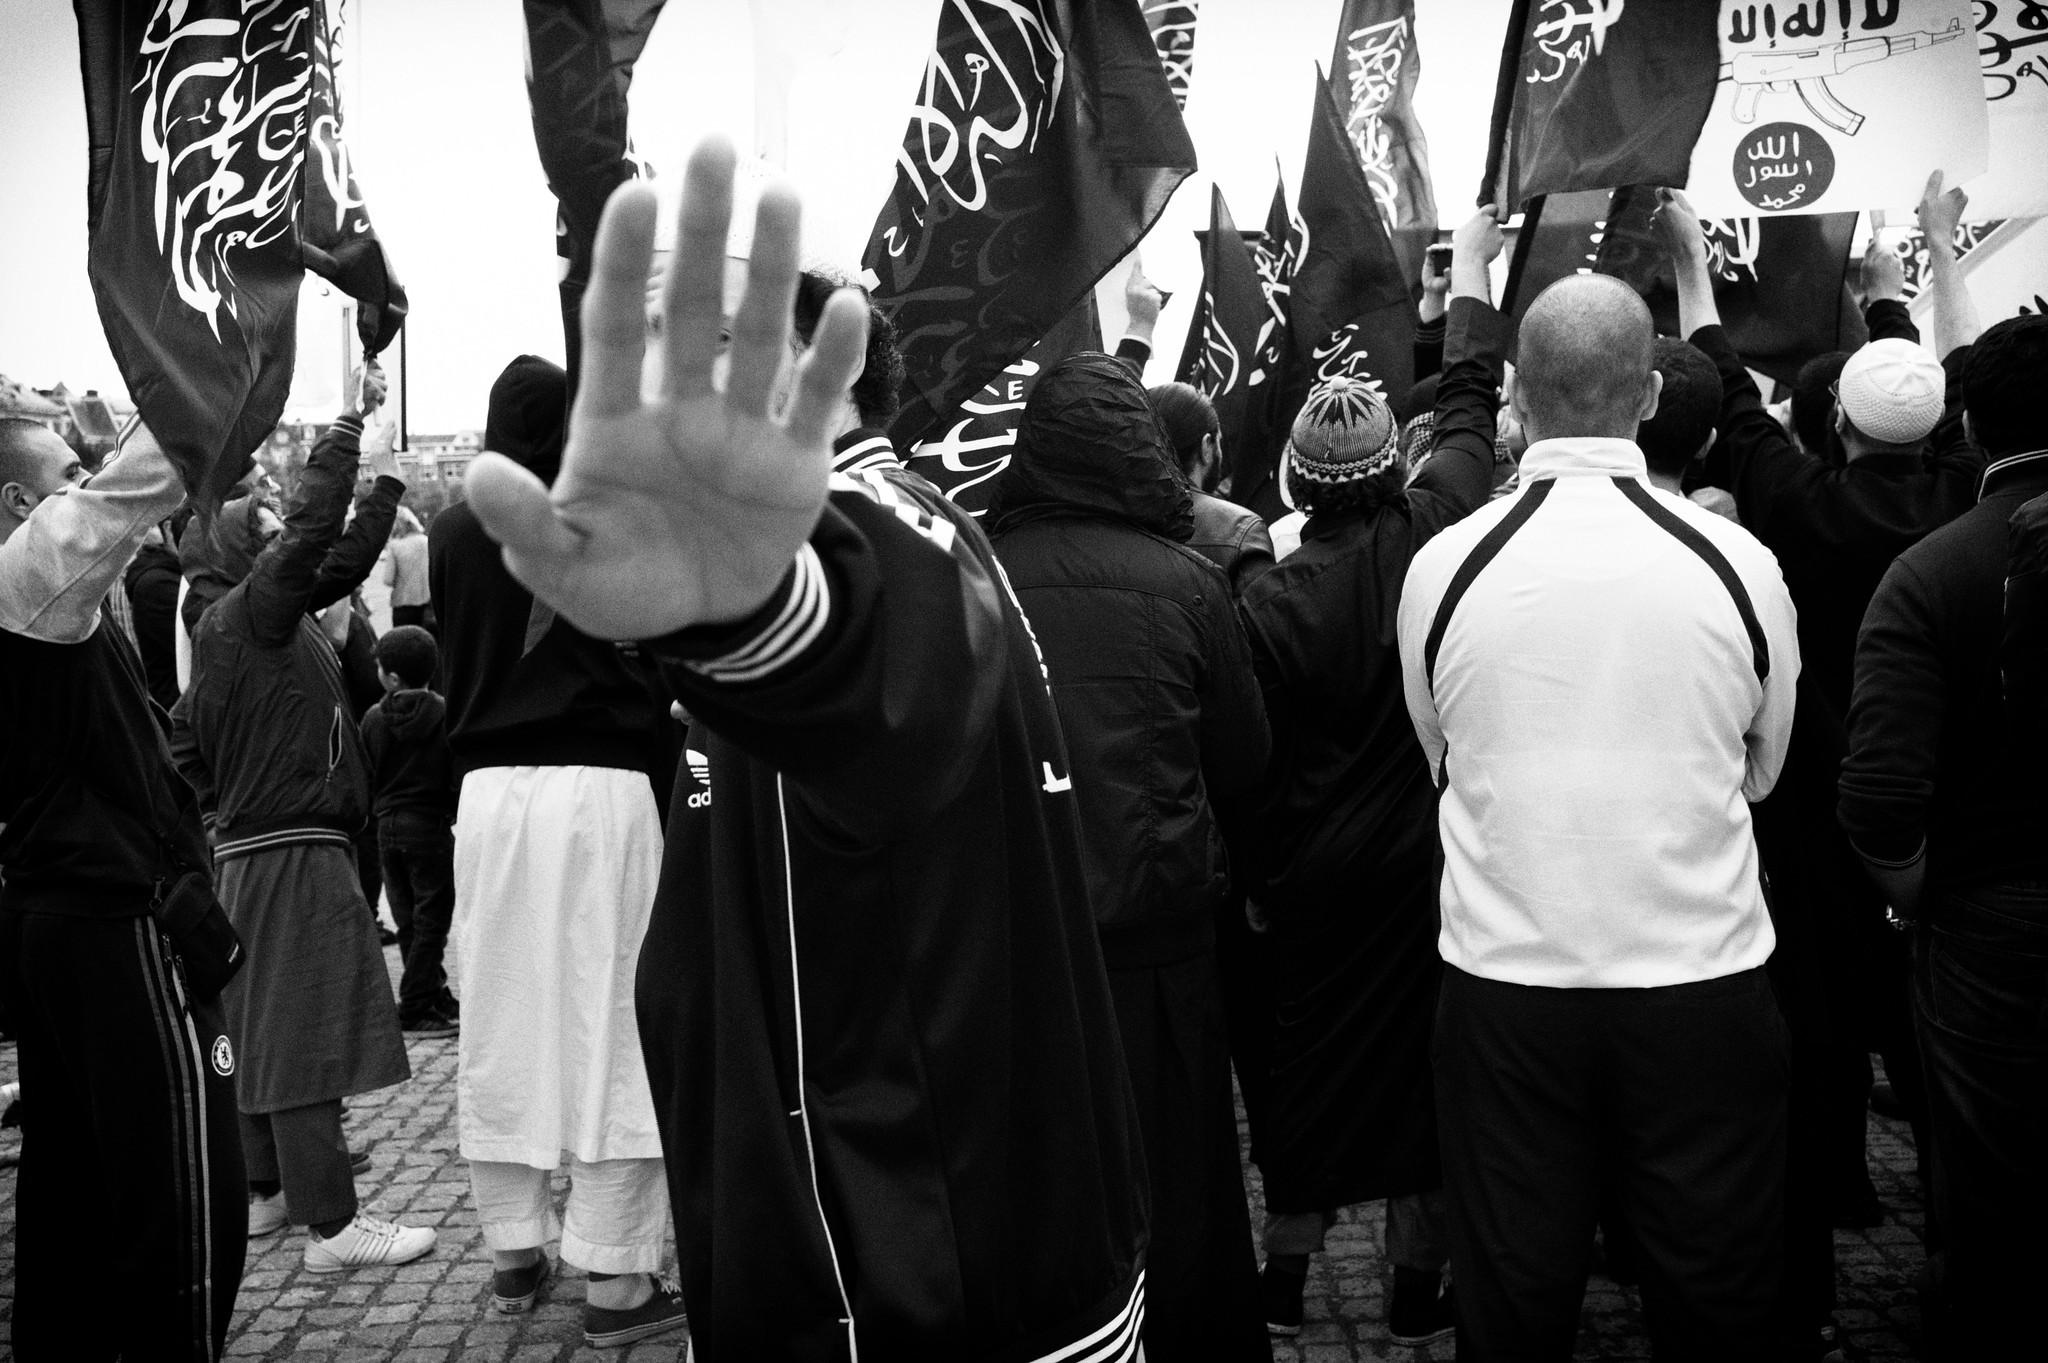 Moslimextremisme Guido van Nispen via Flickr